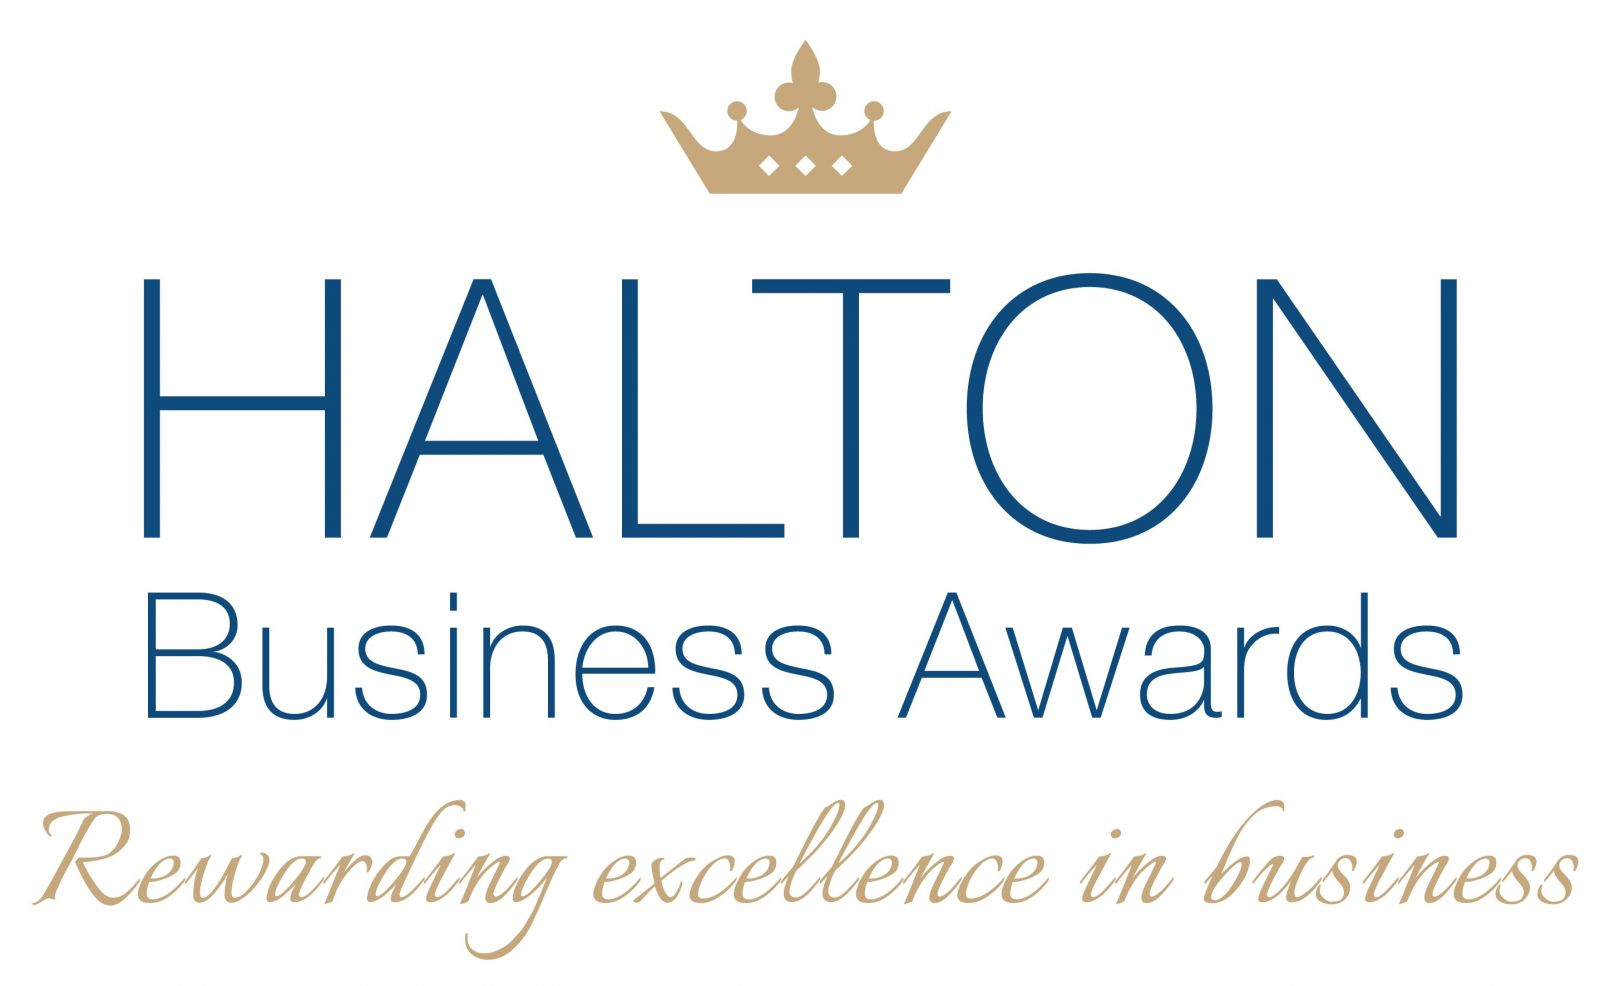 Halton Business Award 2016 Logo